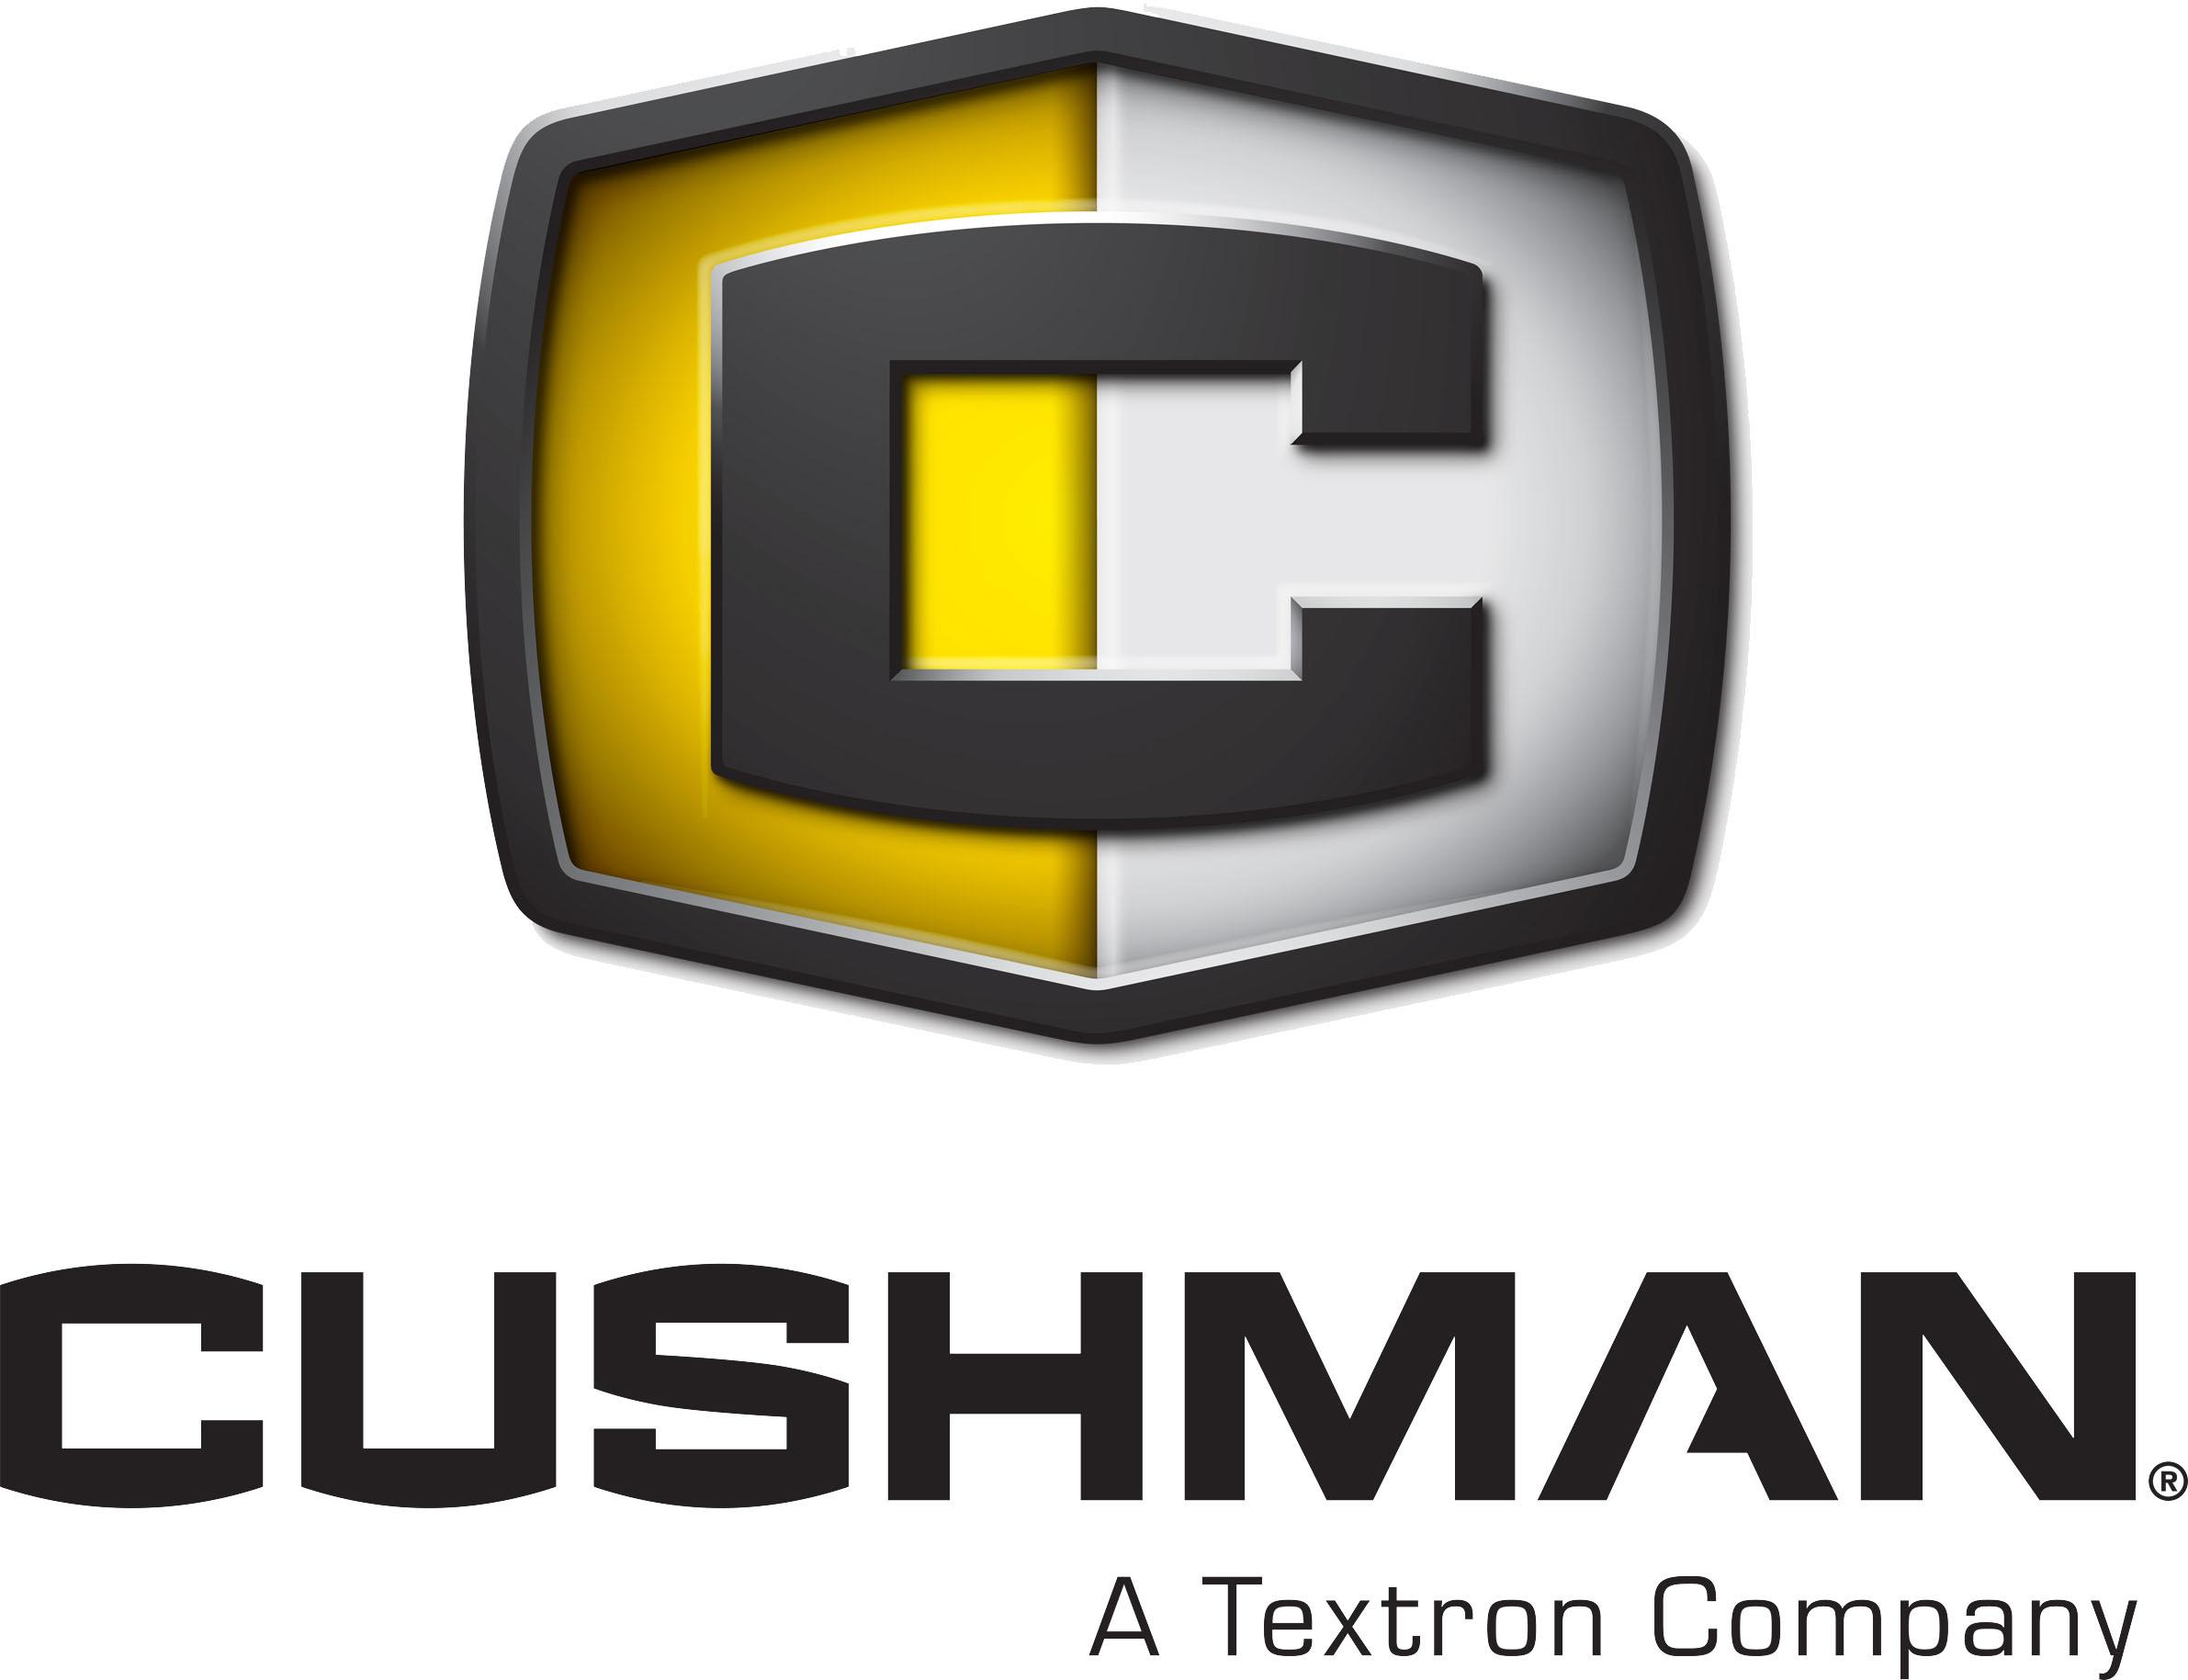 Cushman Utility Carts, Visalia, Tulare, California